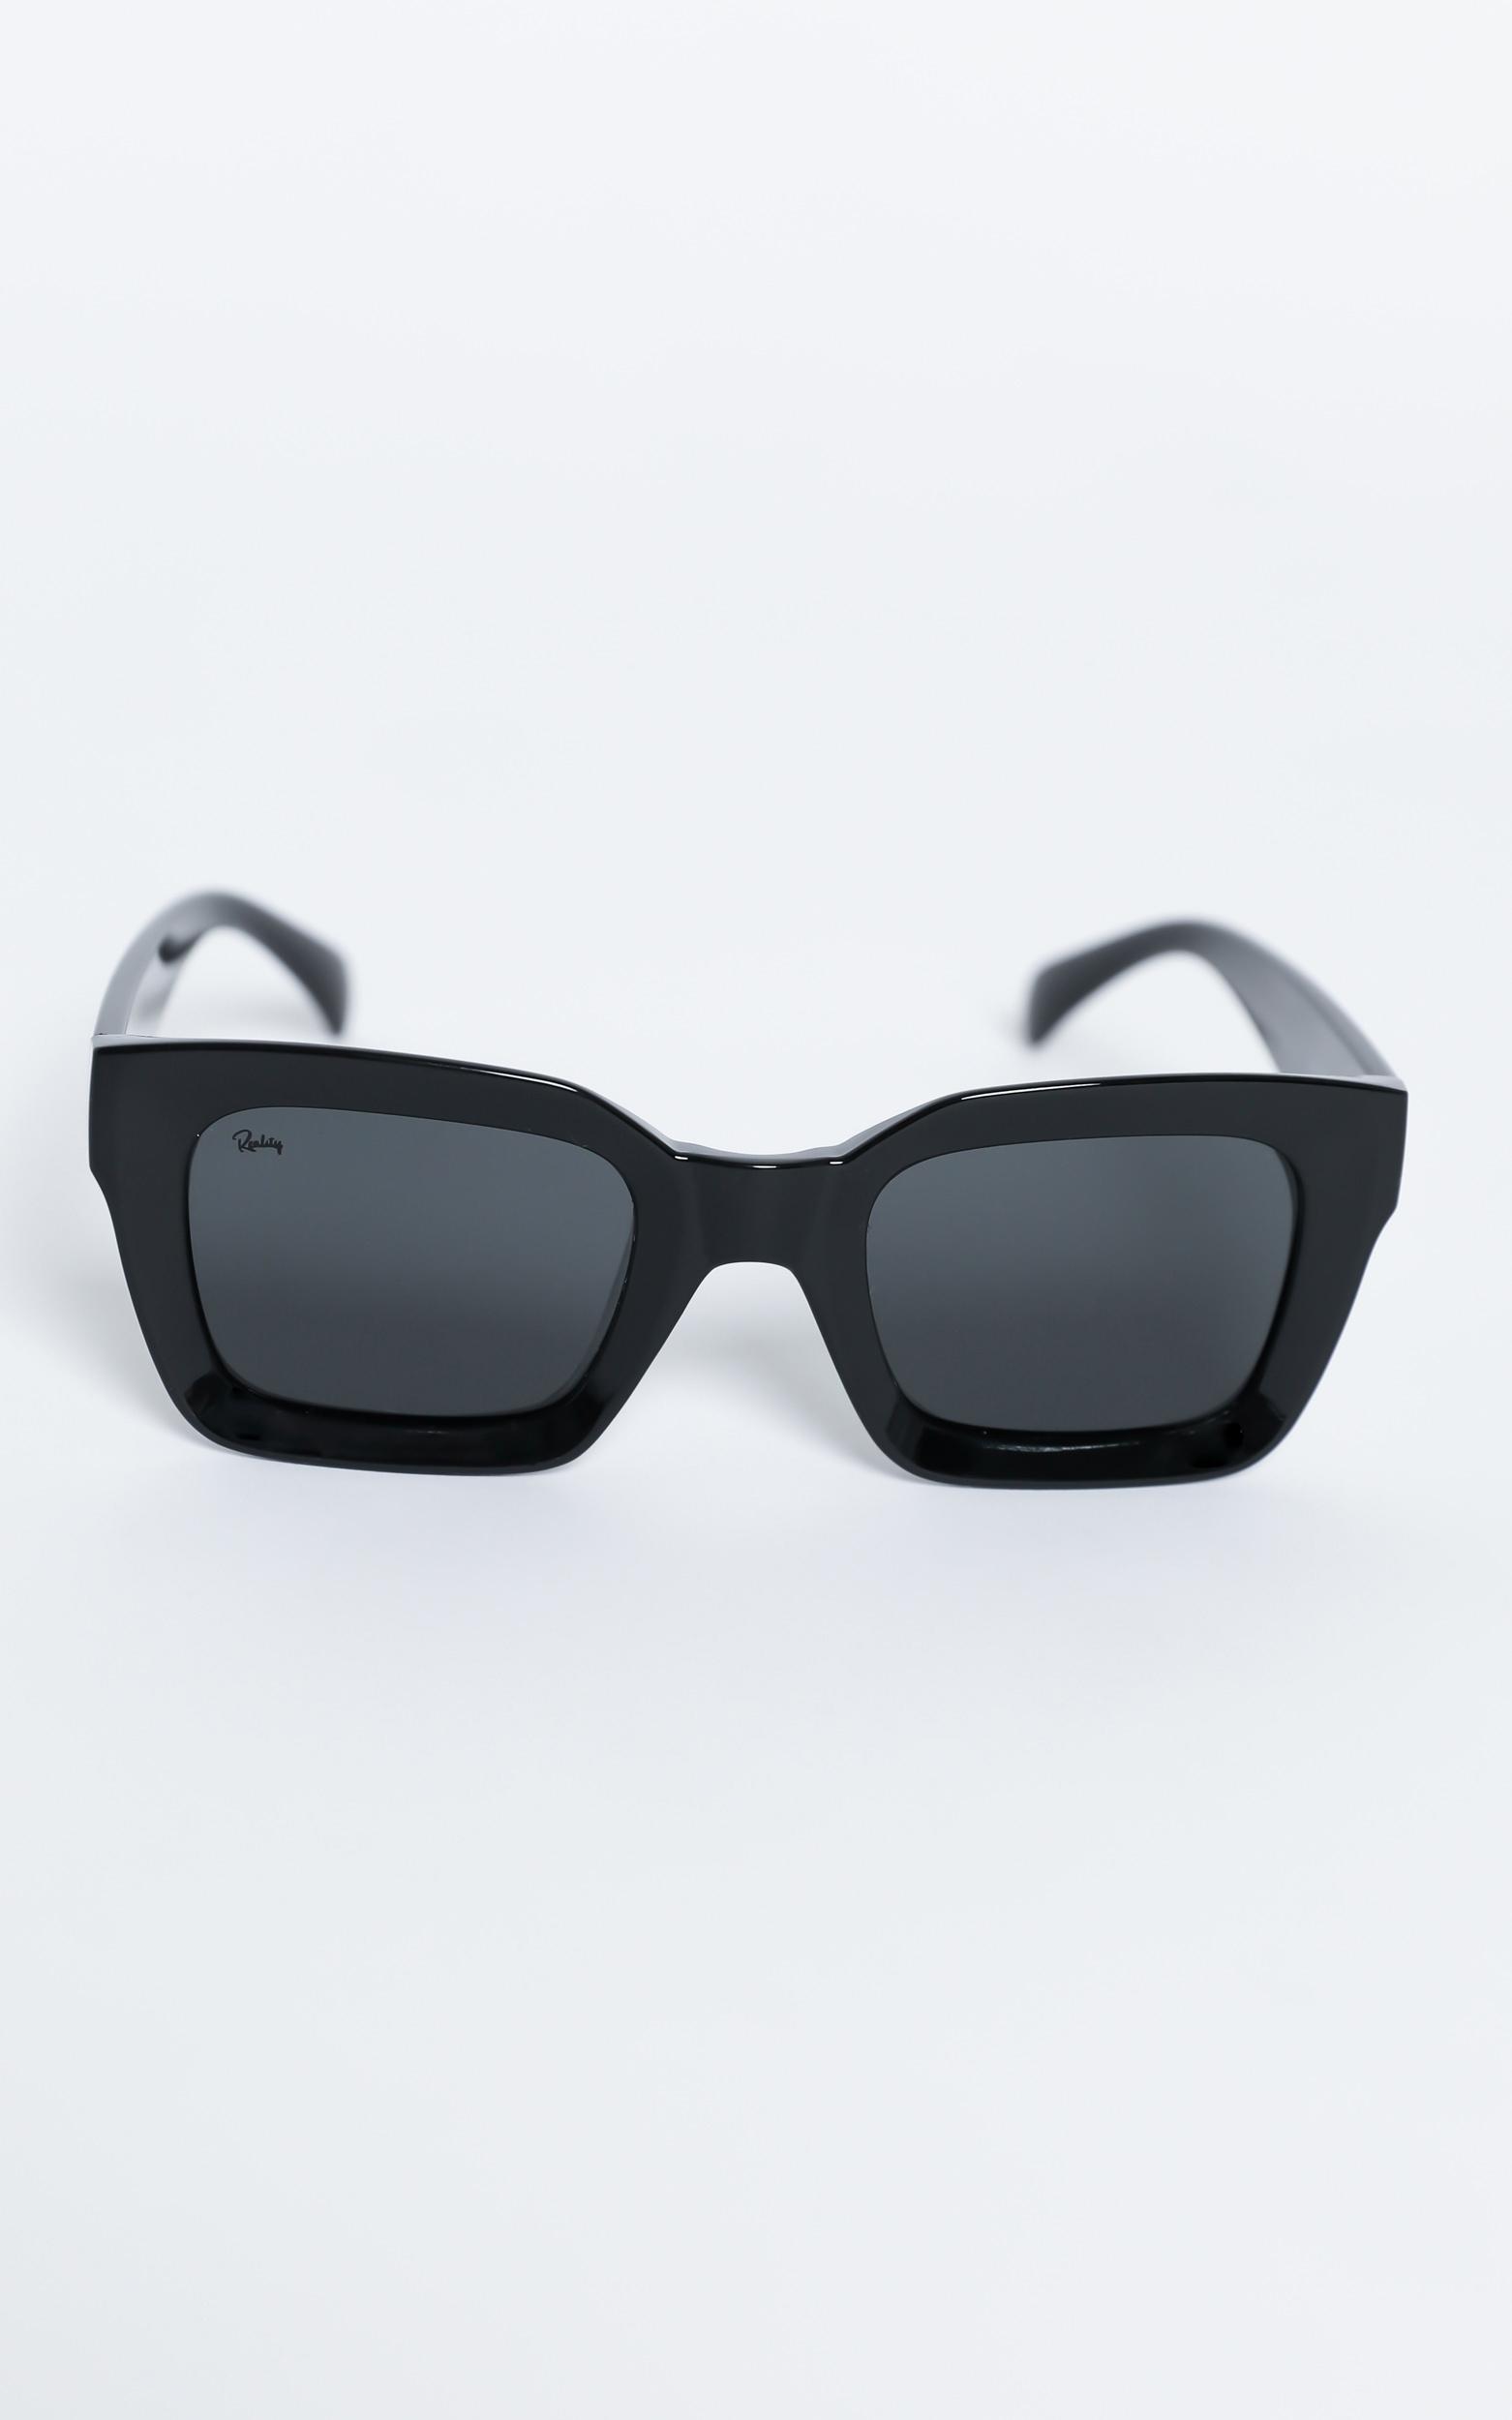 Reality Eyewear - Onassis Sunglasses in Black, Black, hi-res image number null